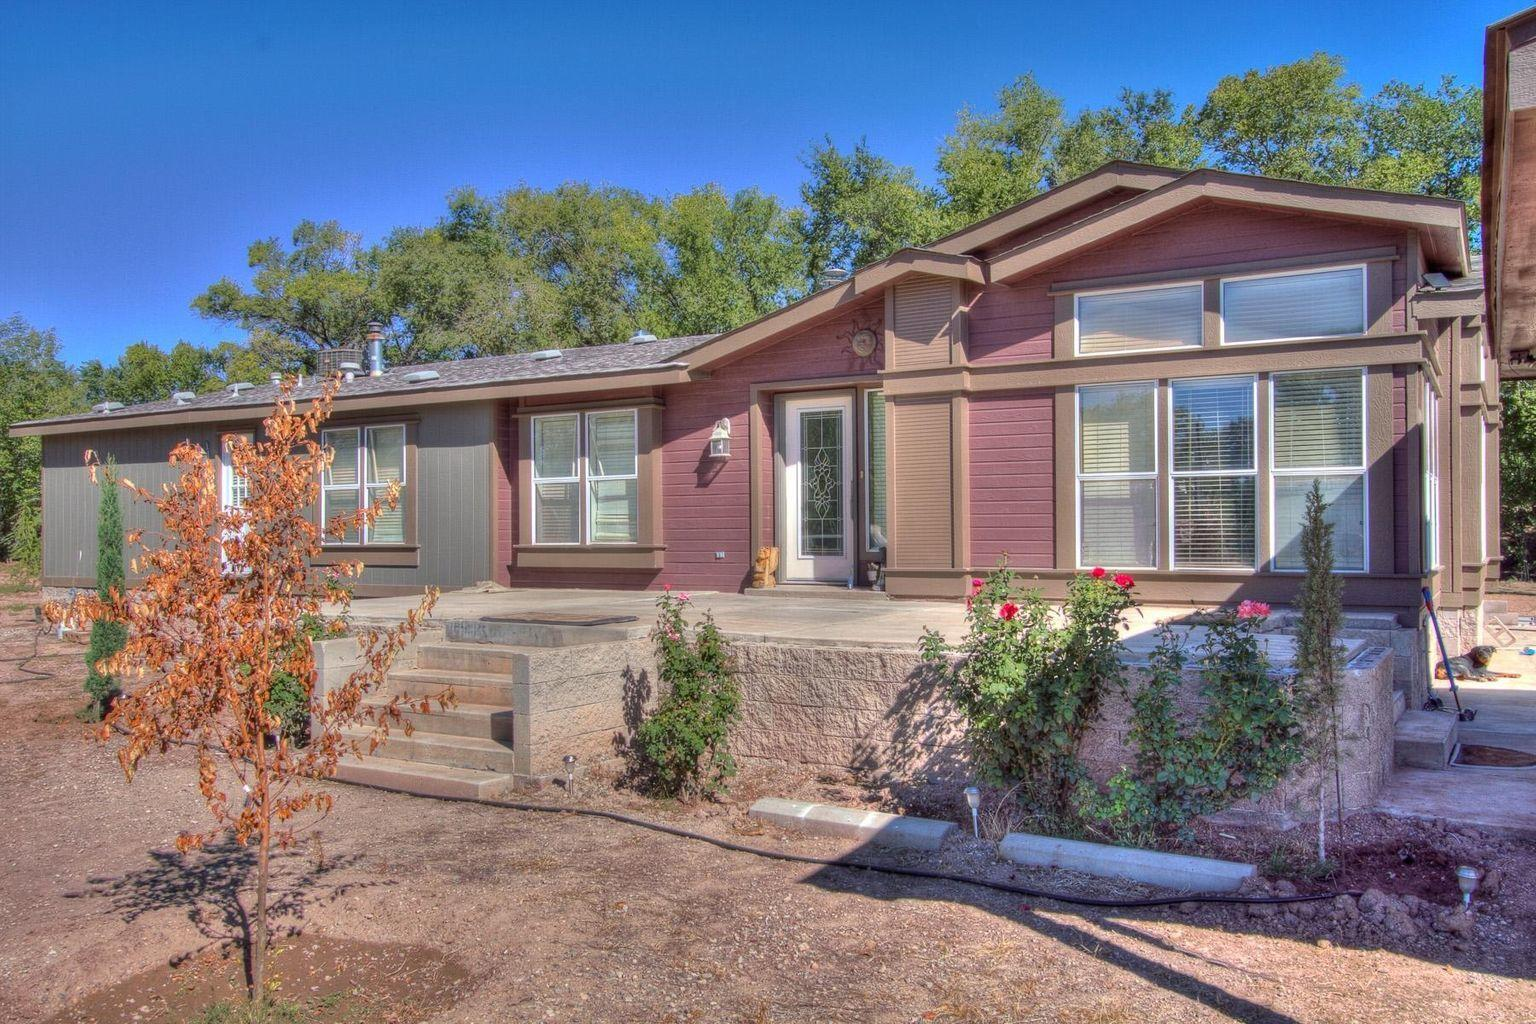 2040 BOSQUE FARMS Boulevard Property Photo - Bosque Farms, NM real estate listing